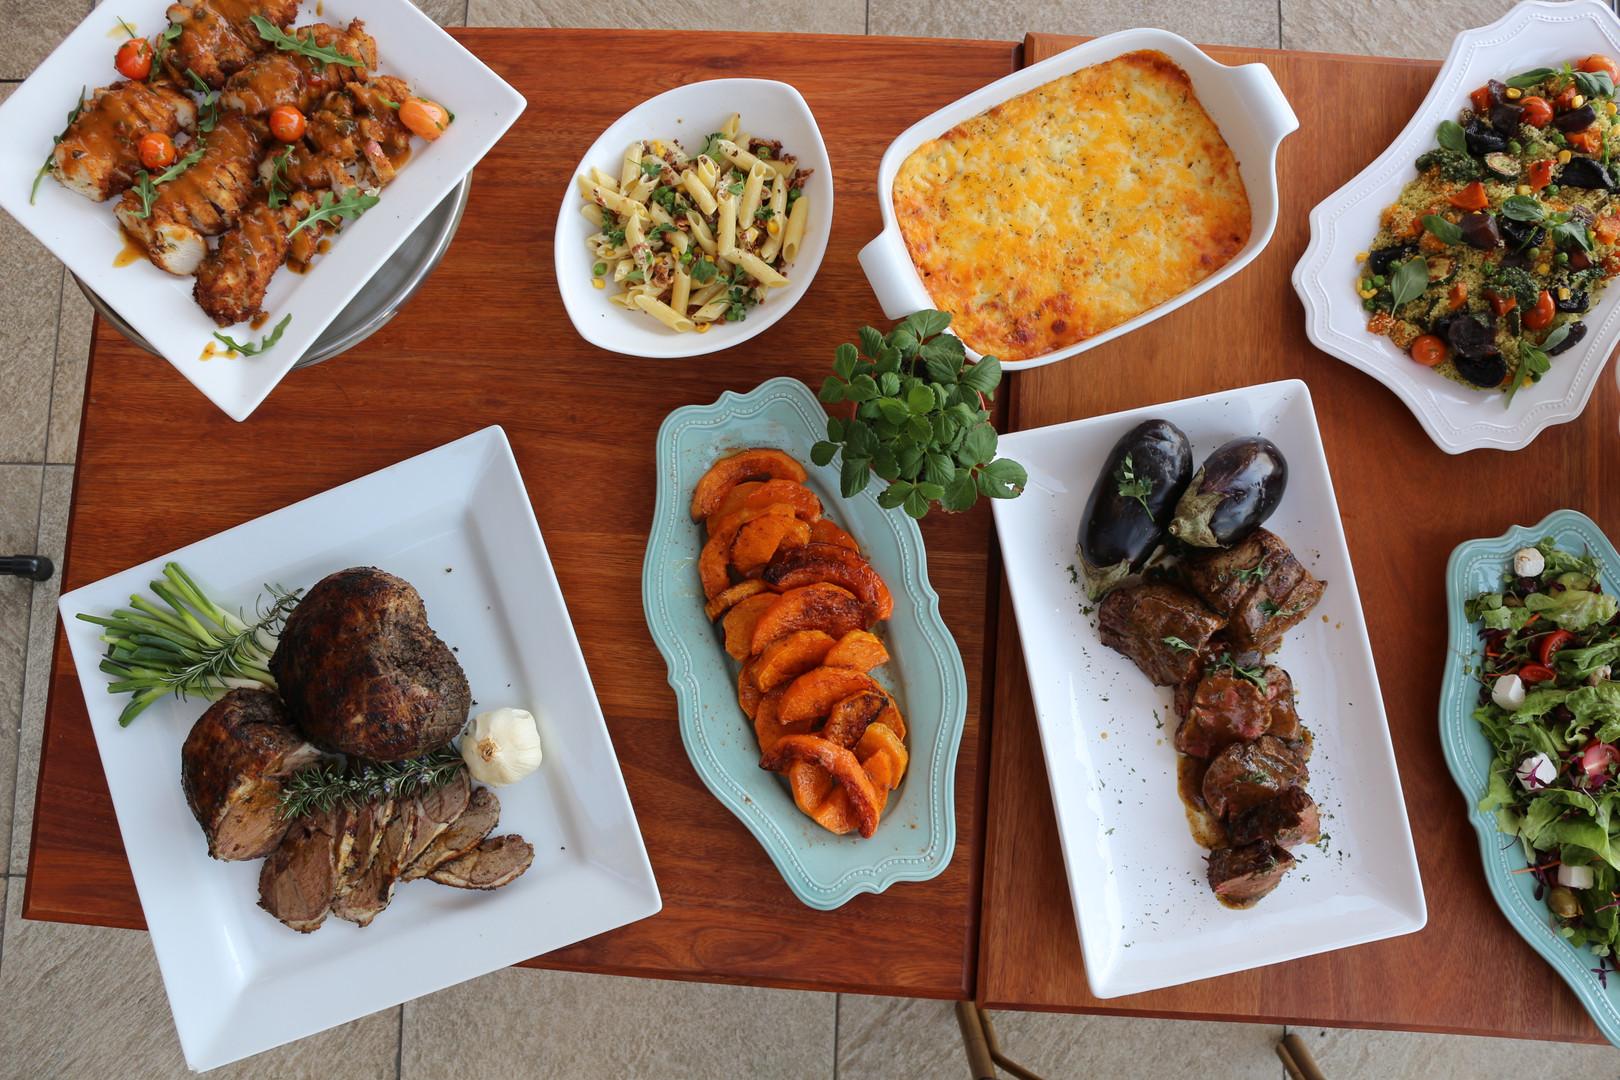 Food platter 7 at Carmella's.JPG